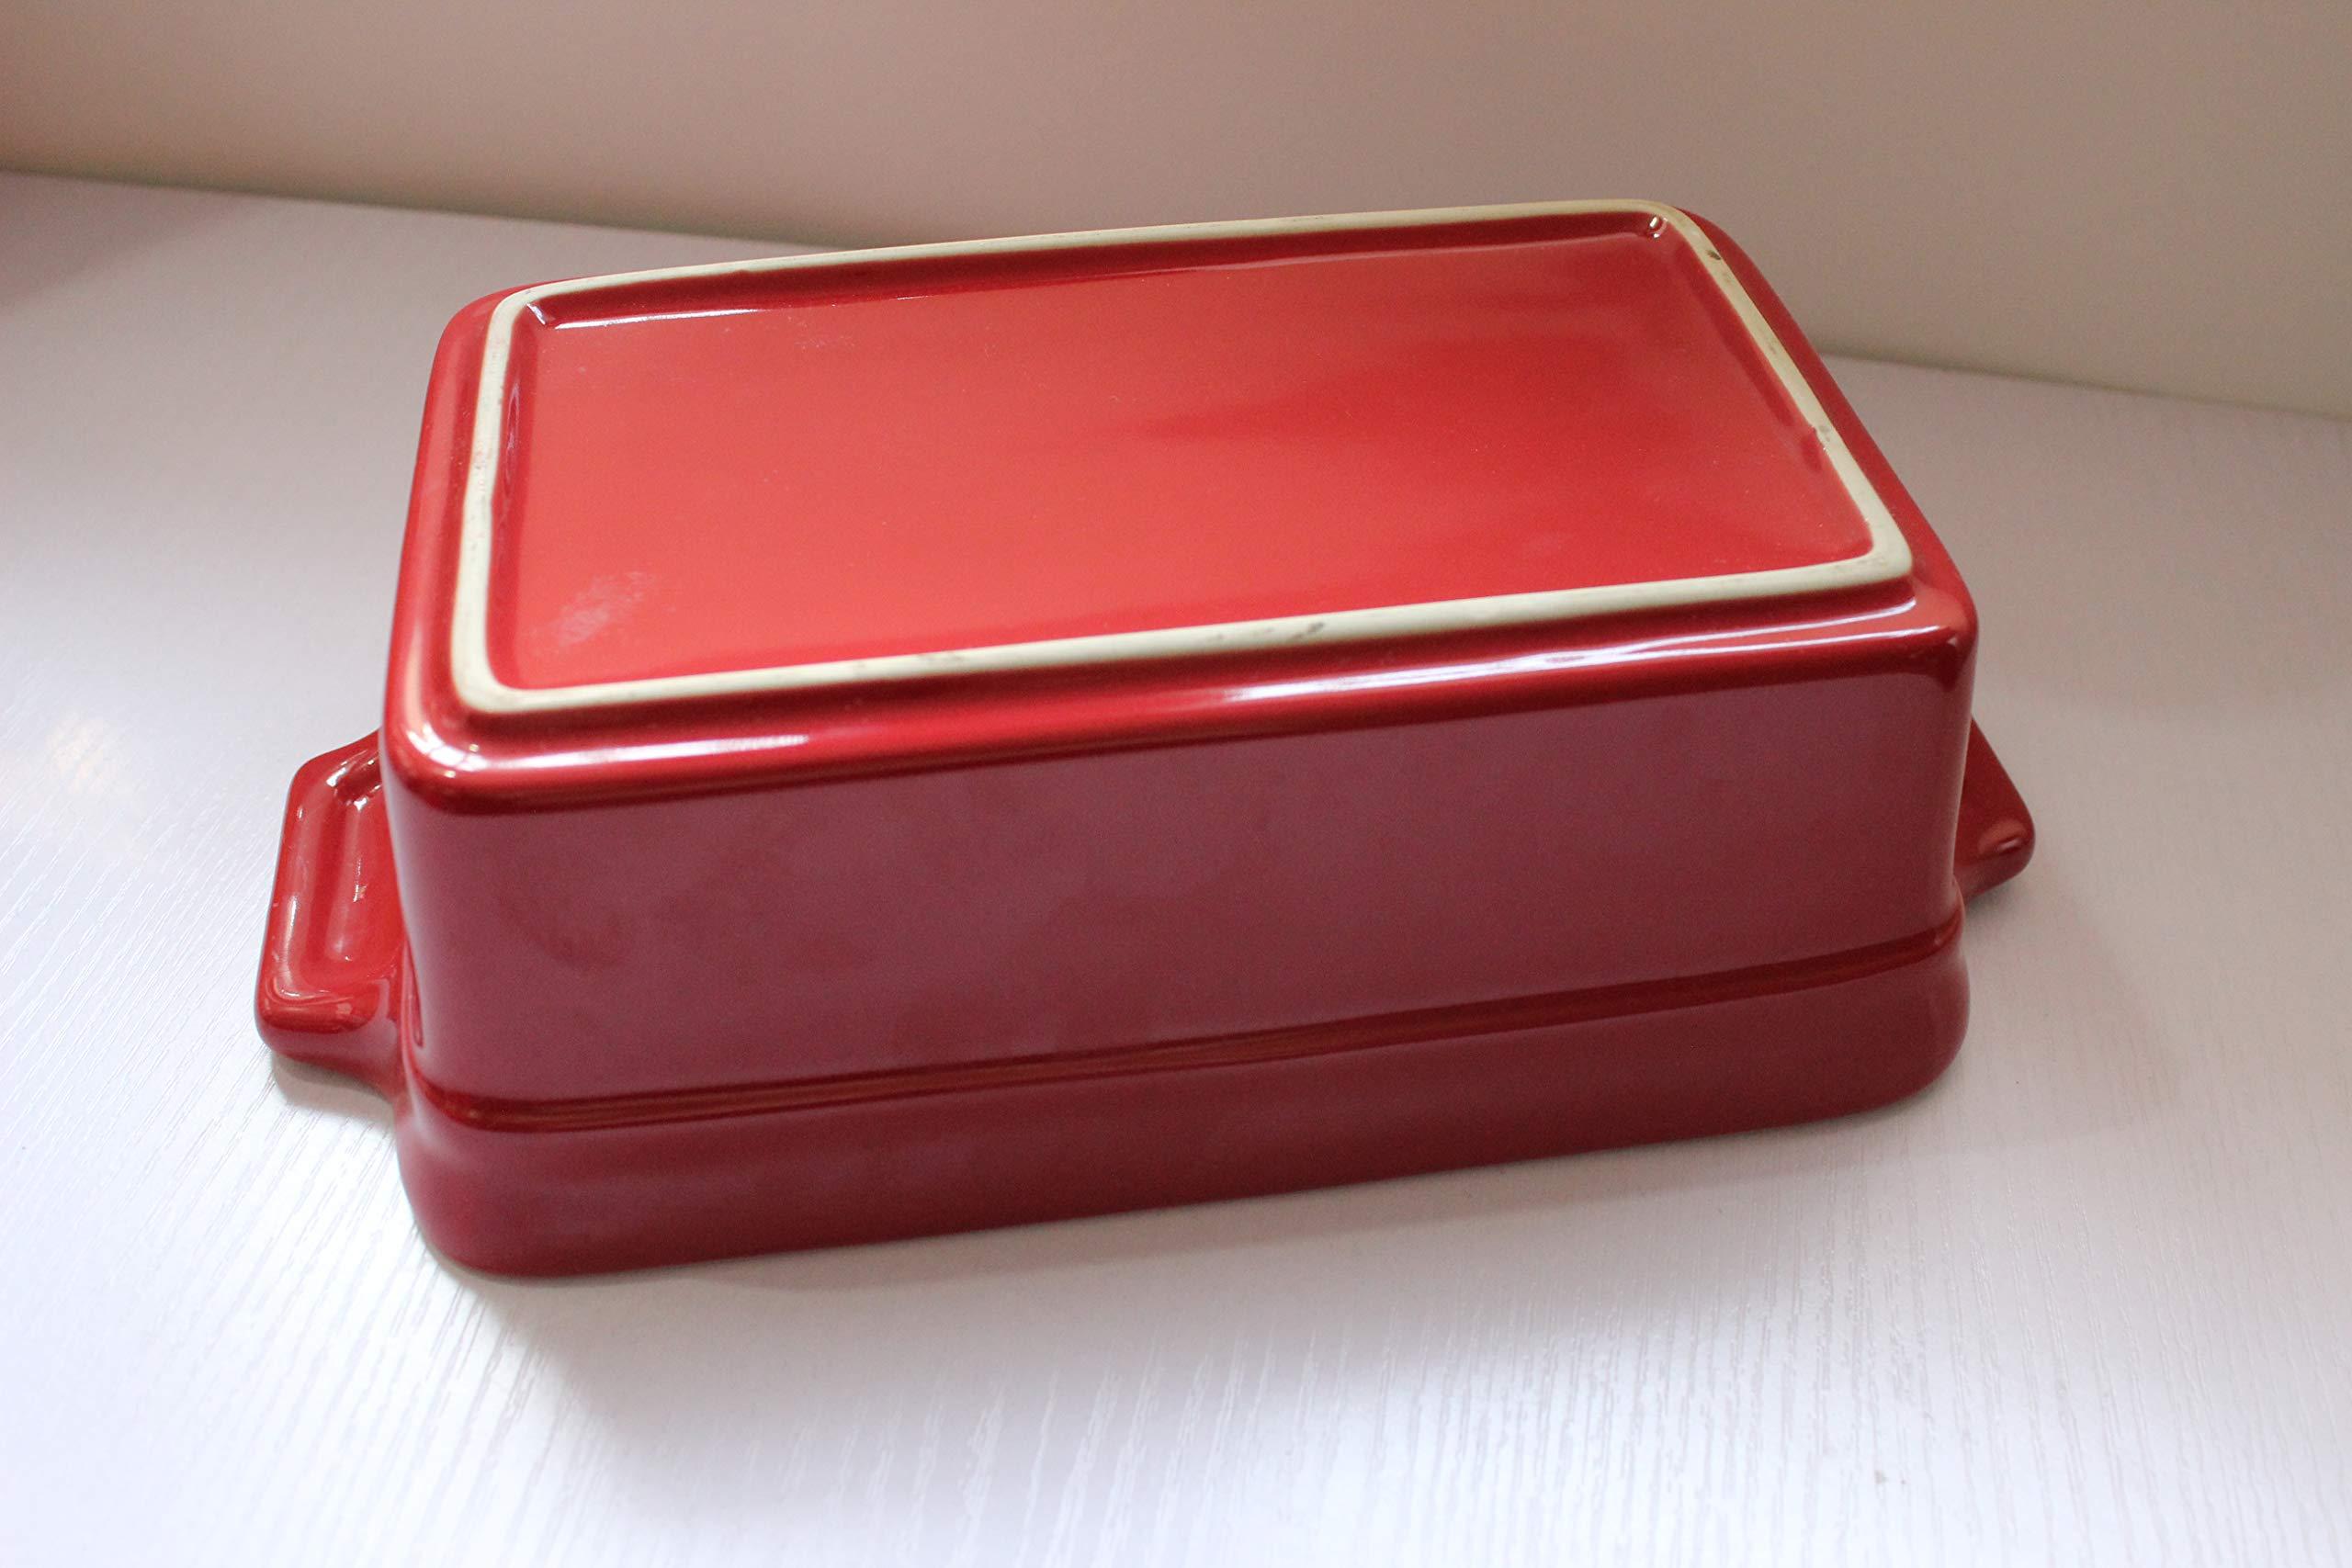 Lonovel Rectangular Baking Dish Roasting Lasagna Pan,11.5-Inch Classic Stoneware Ceramic Large Rectangular Bakers,Red by Lonovel (Image #3)